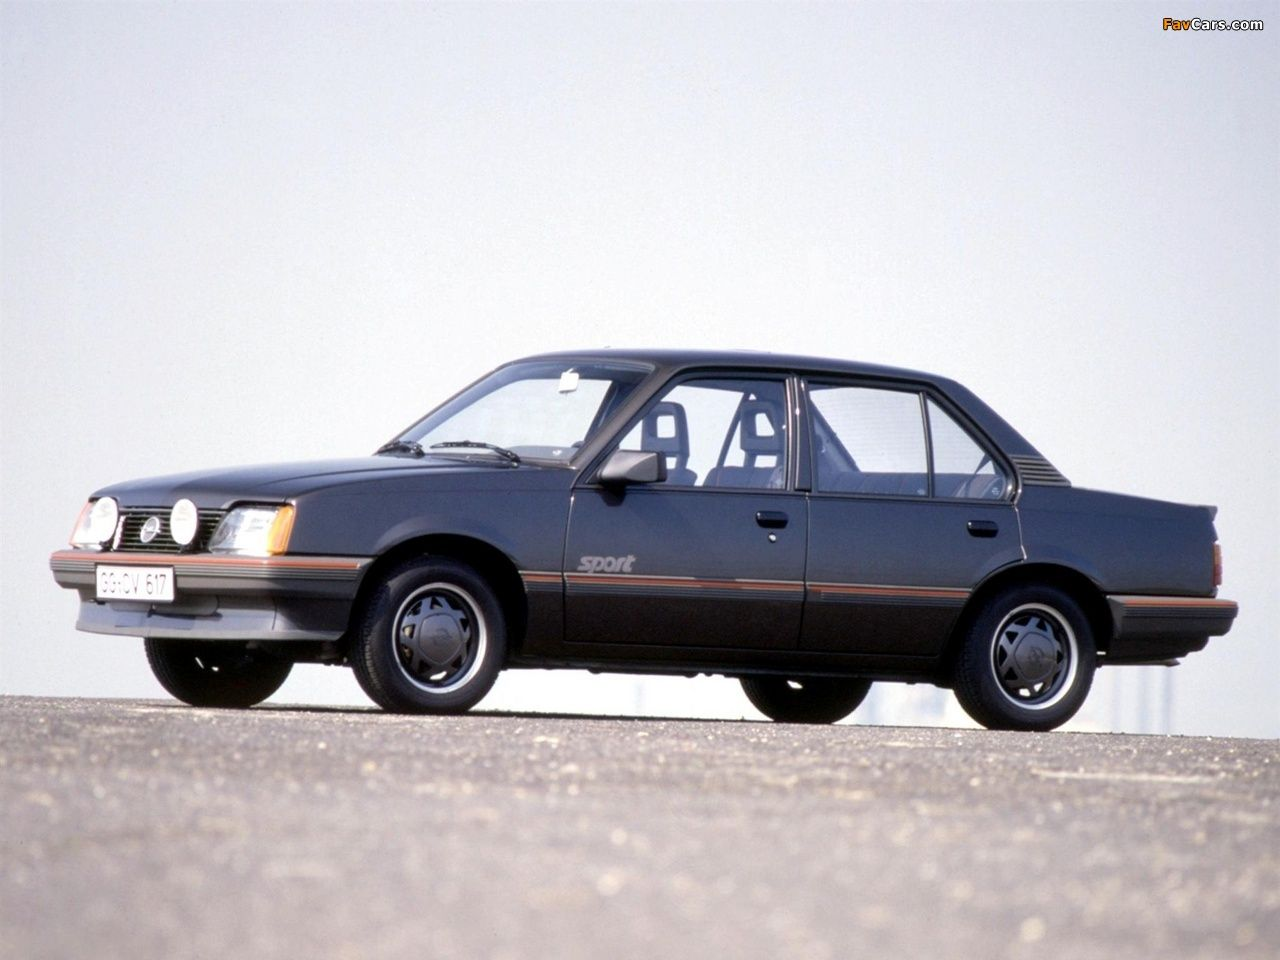 1984 opel ascona c sport classic cars opel manta. Black Bedroom Furniture Sets. Home Design Ideas